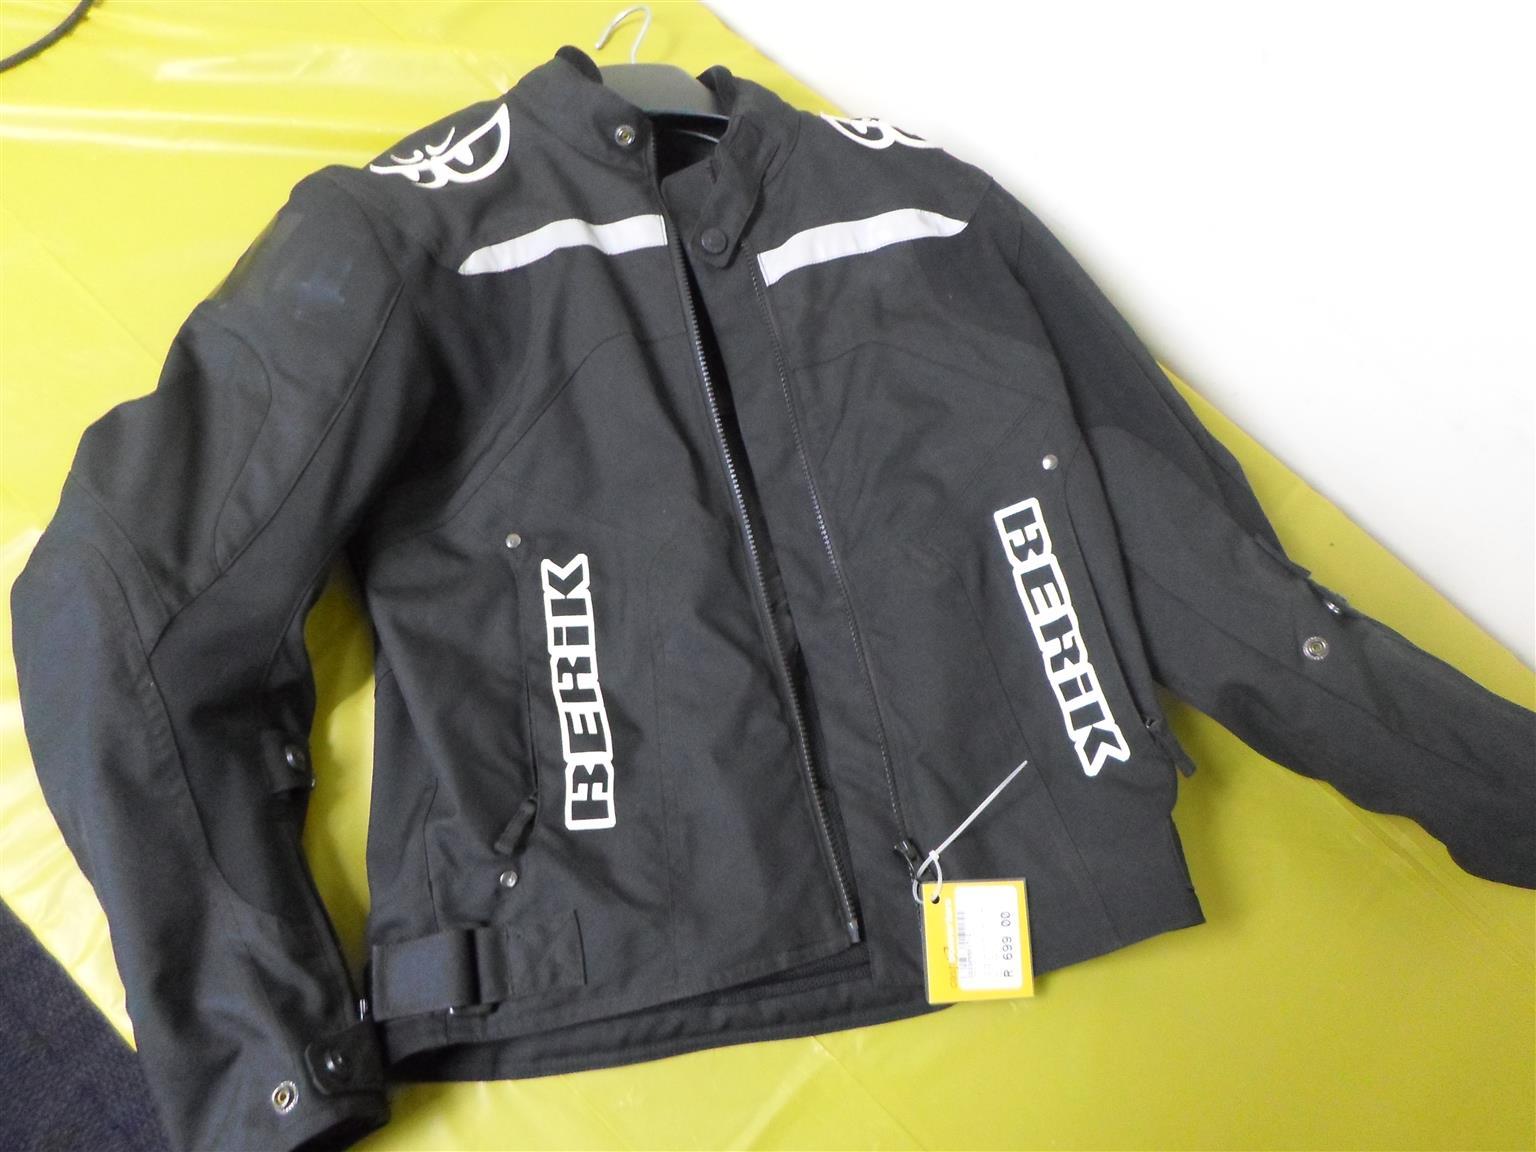 Size 48 Berik Motorcycle Jacket